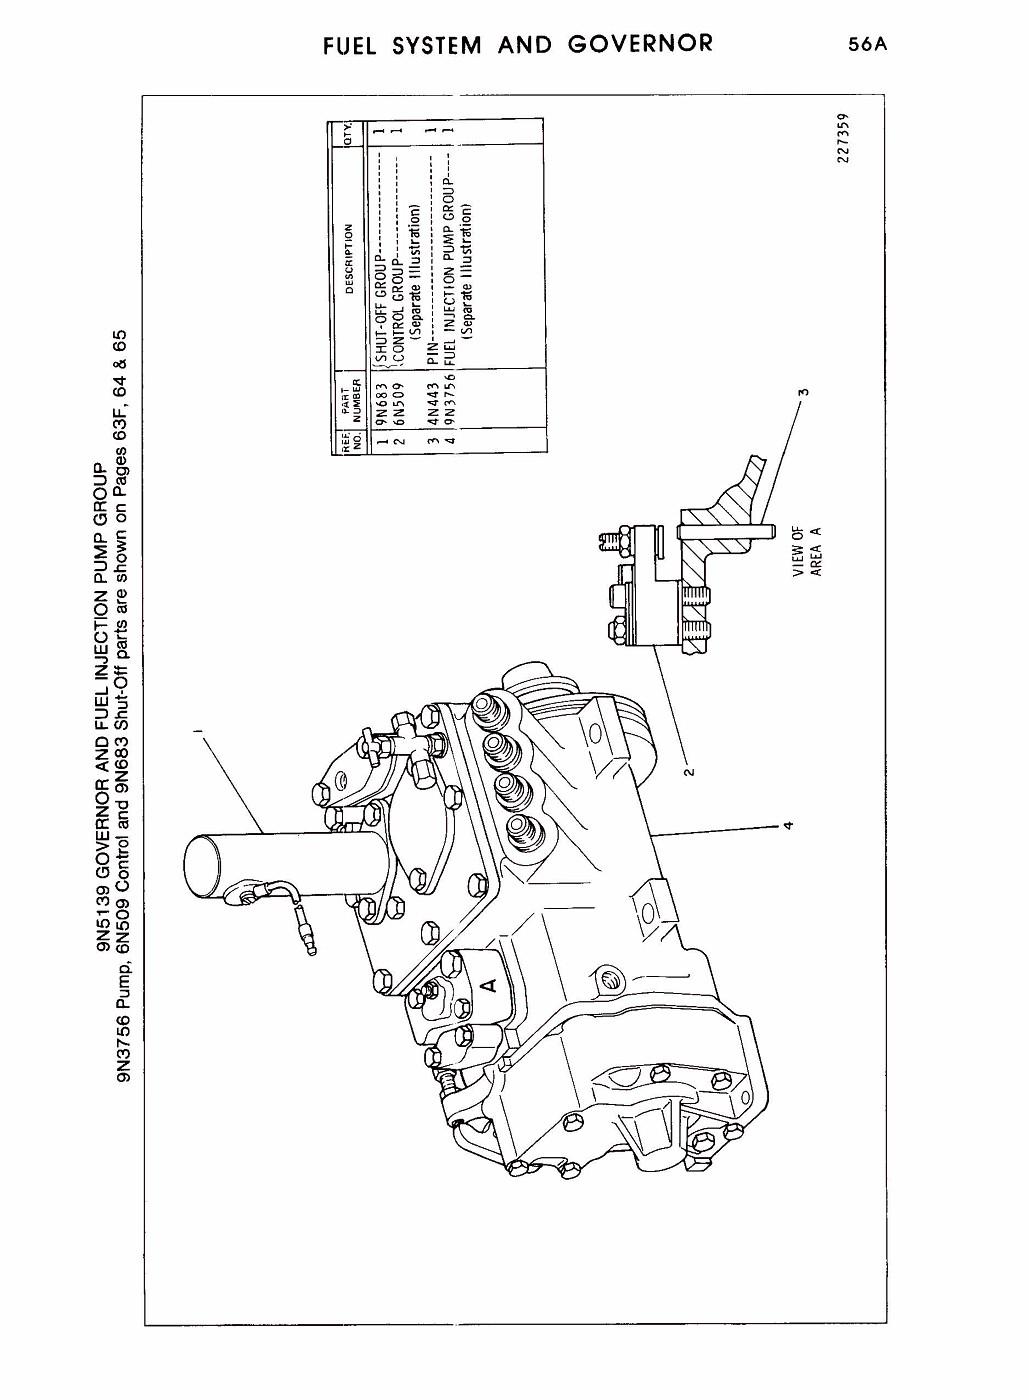 Cat 3208 Injection Pump Diagram